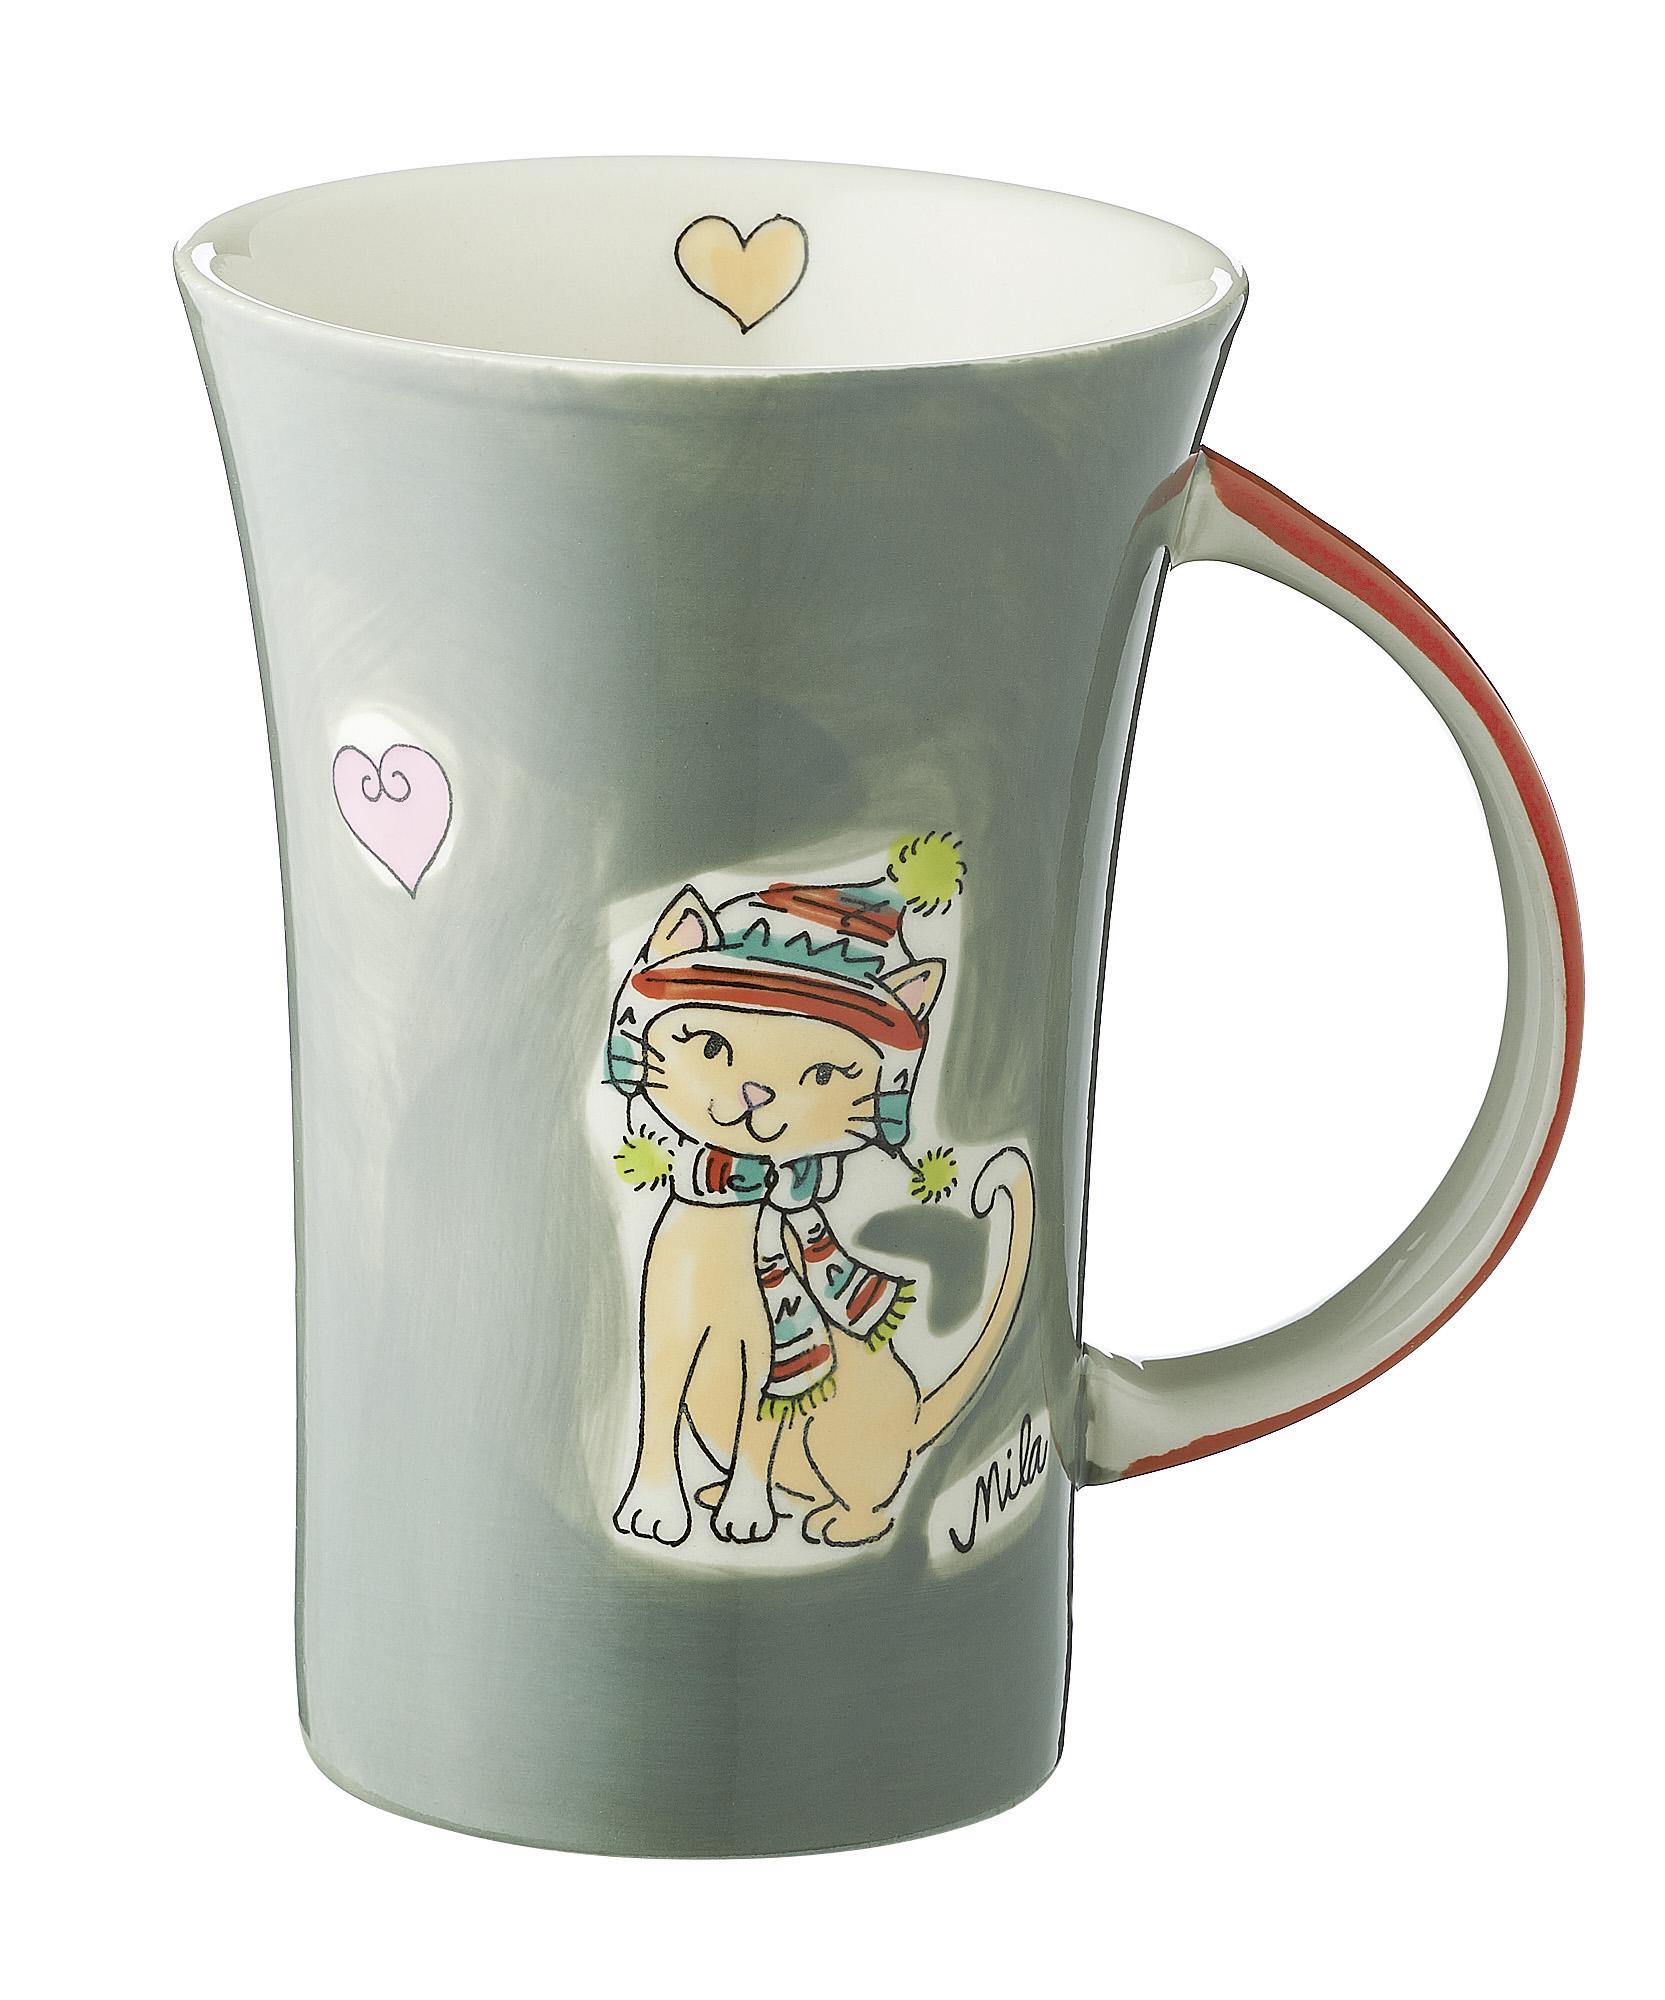 Coffee Pot - Winterkatze